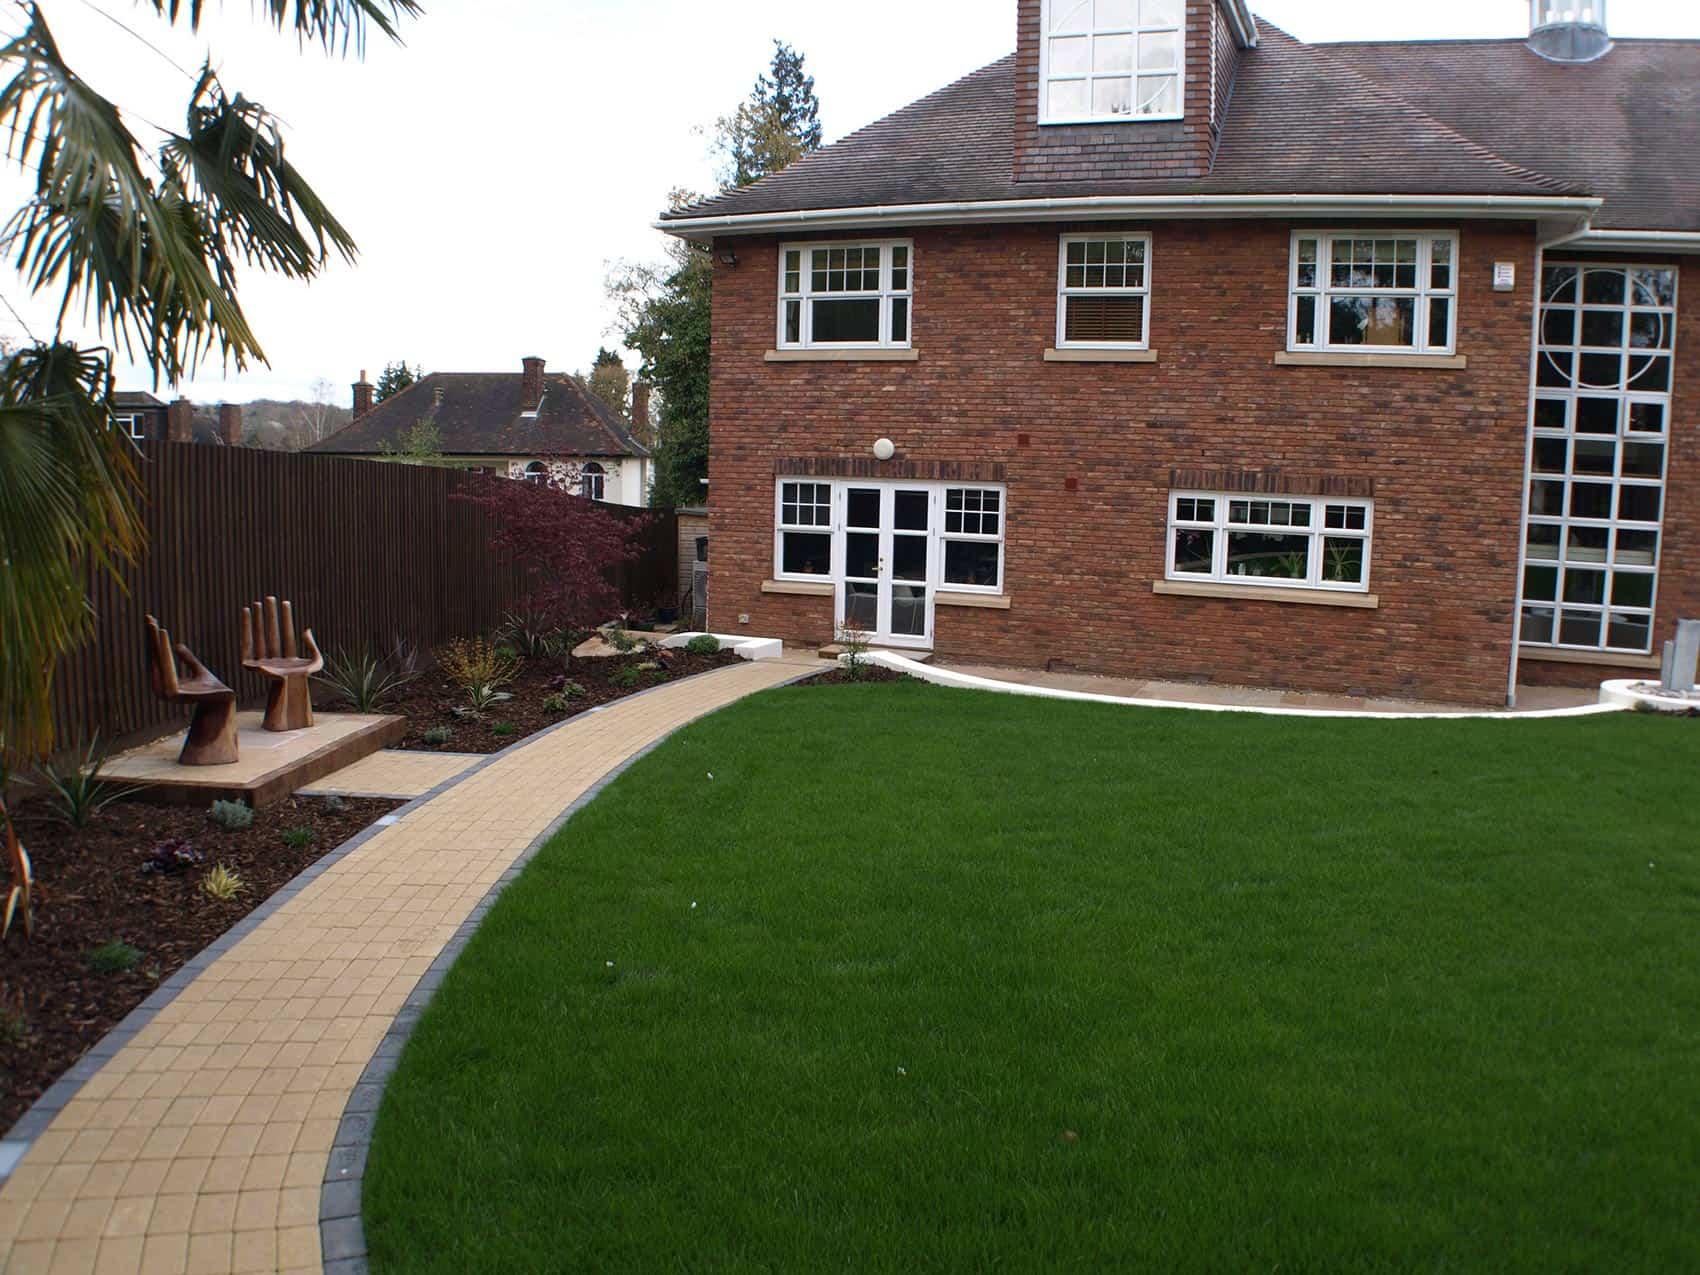 main - Gardens For Good - Garden Design in Oxfordshire ...